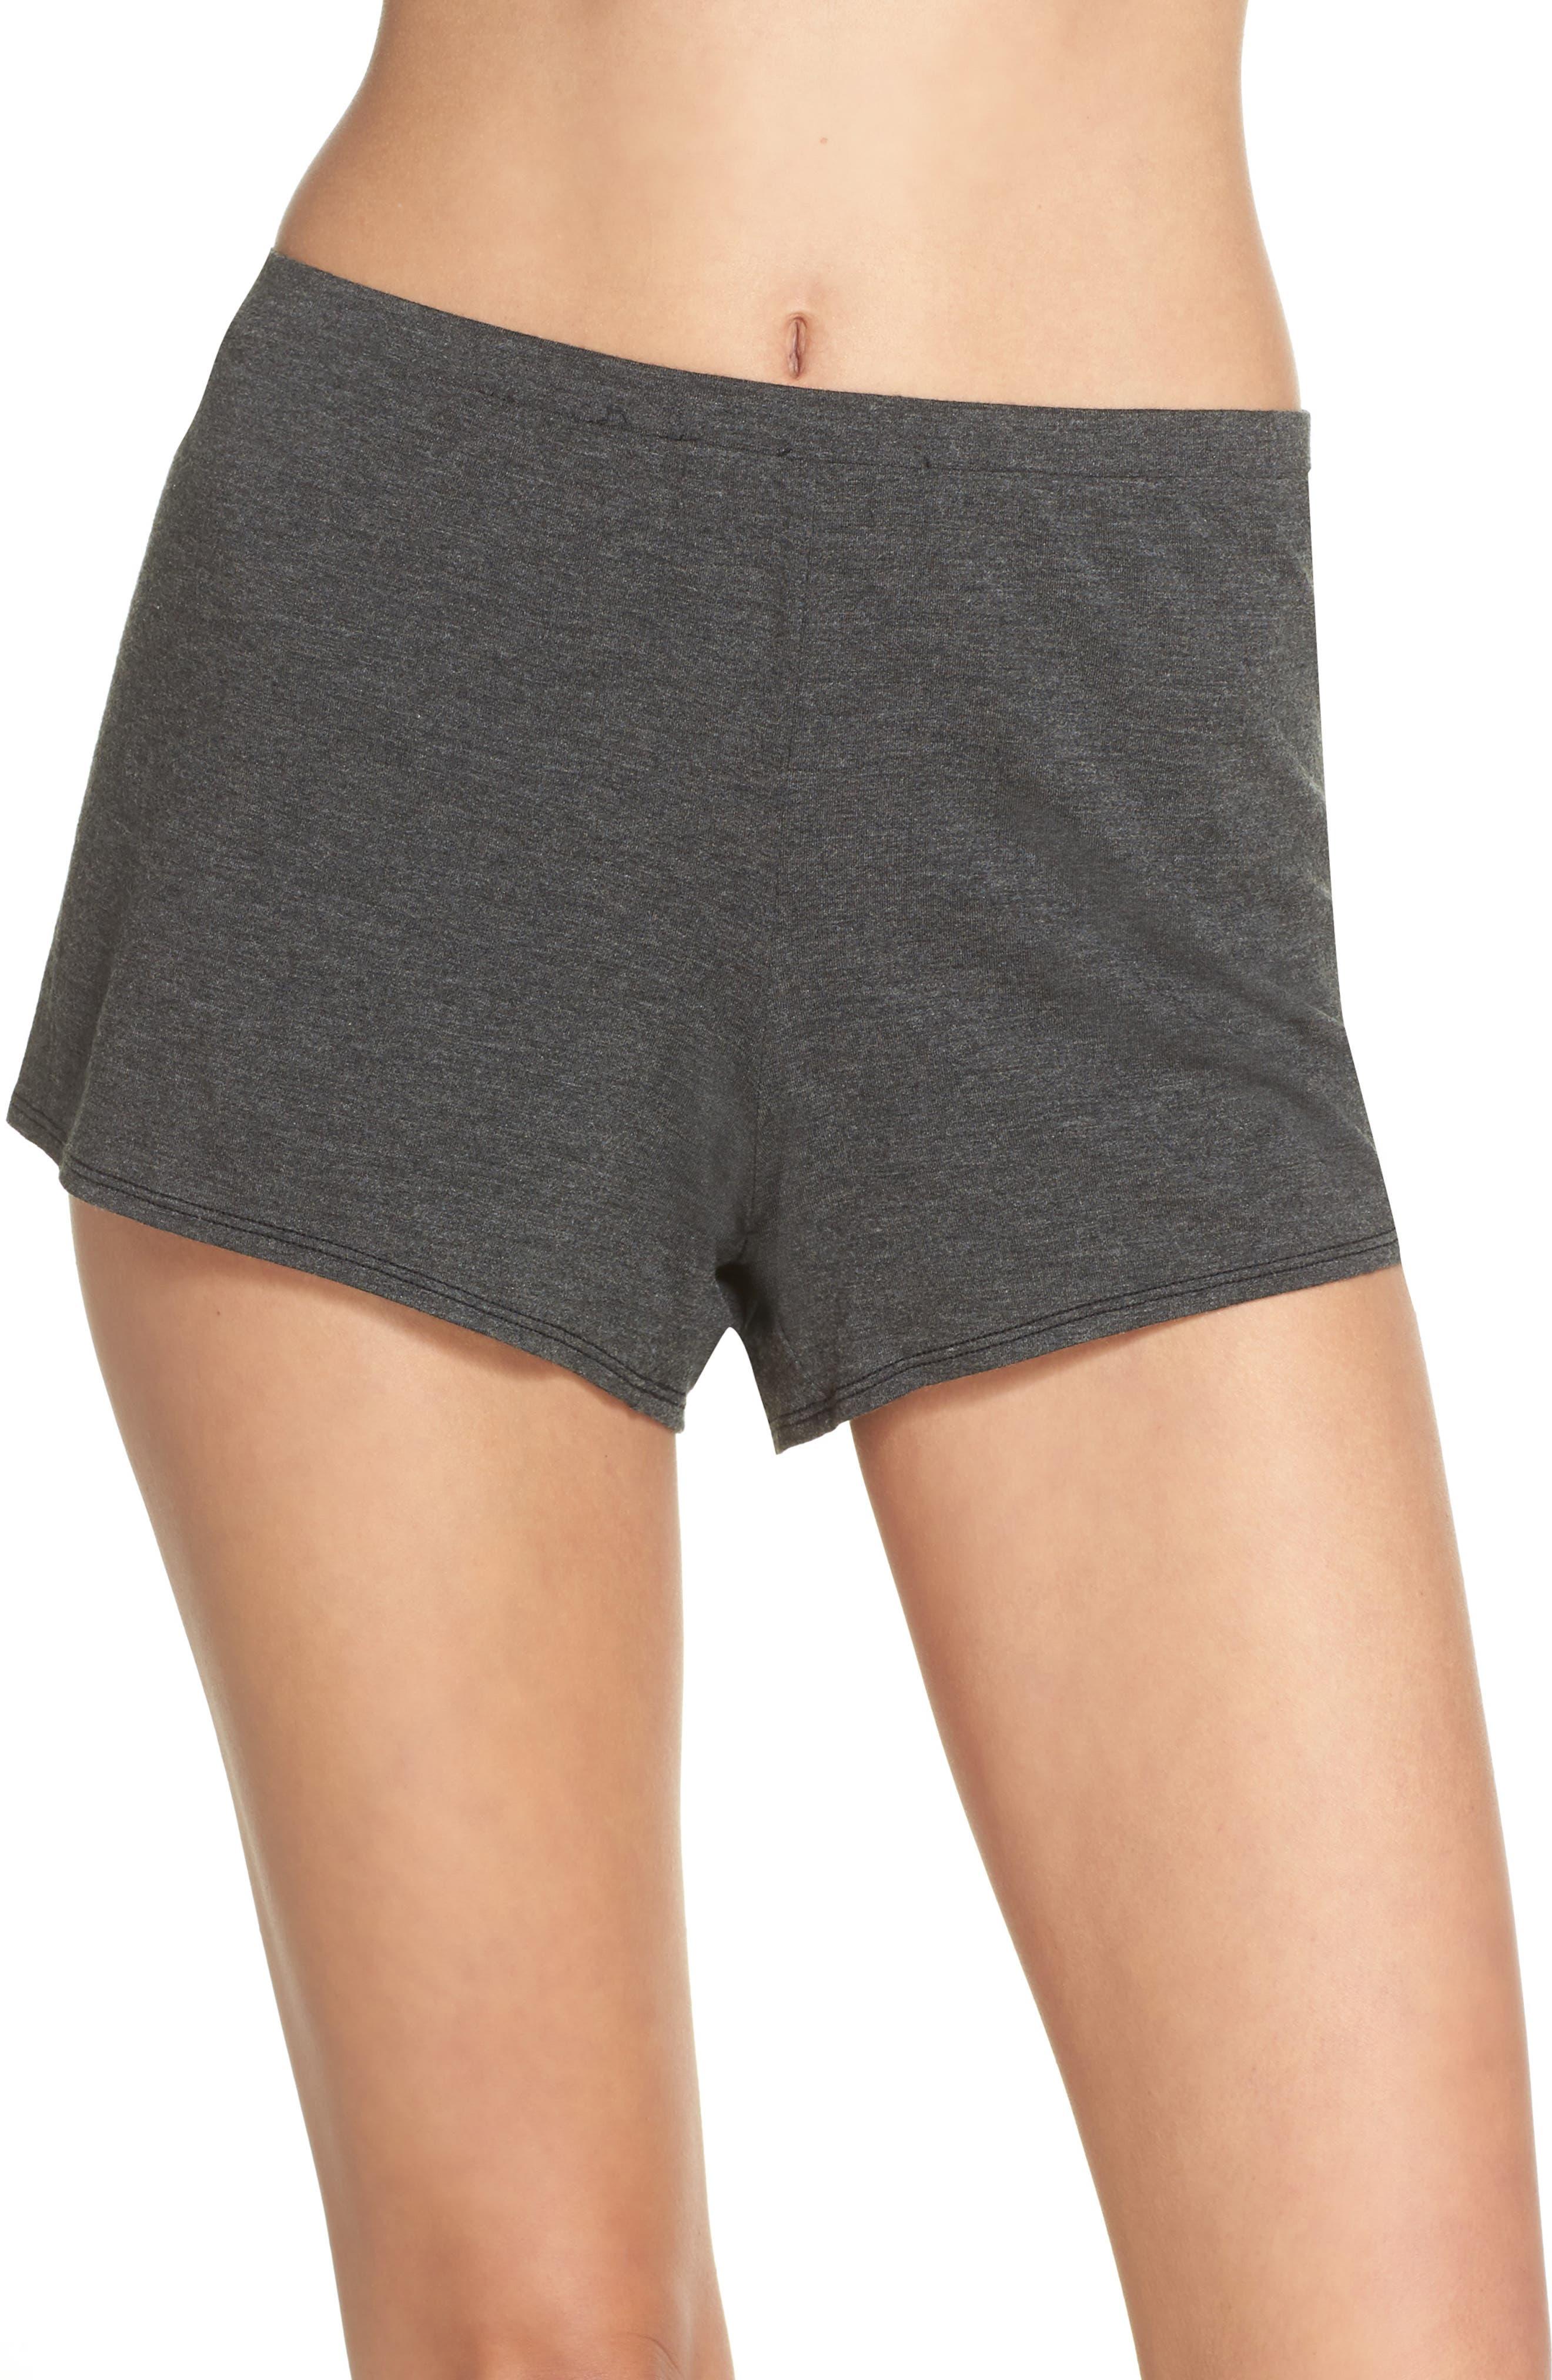 Undressed Pajama Shorts,                         Main,                         color, 001